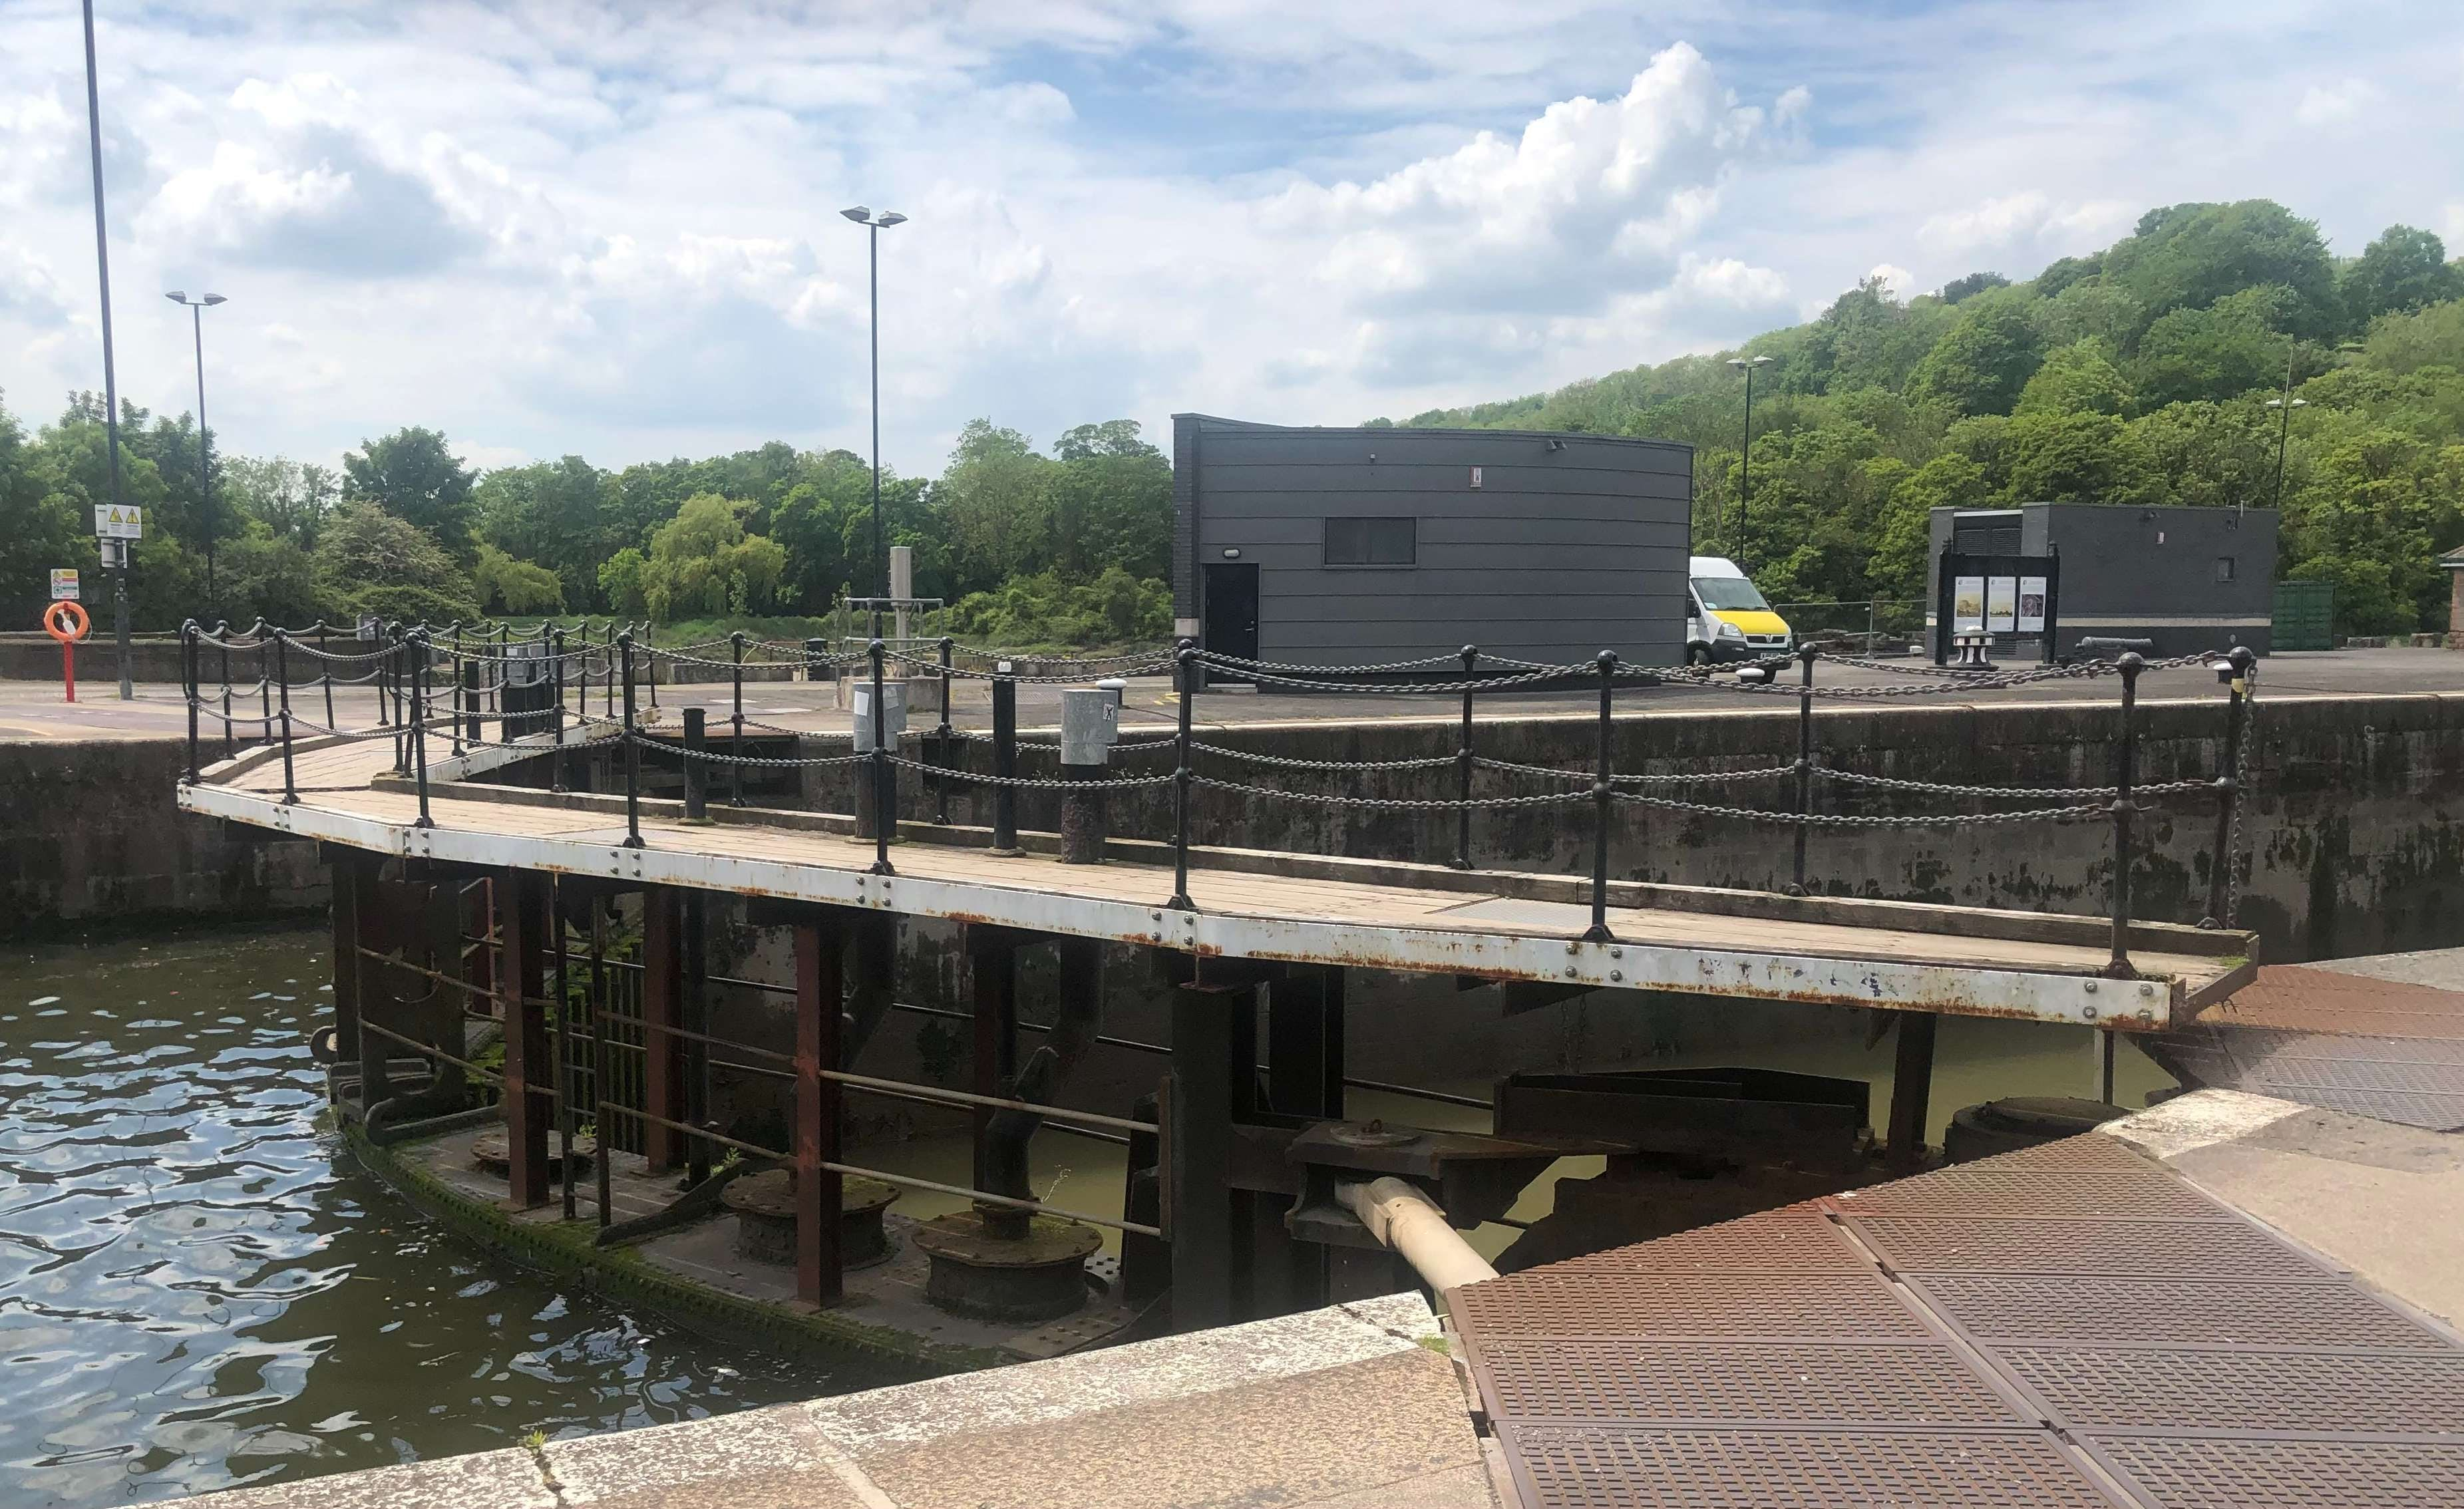 Waterfront Bristol: The Views & History image